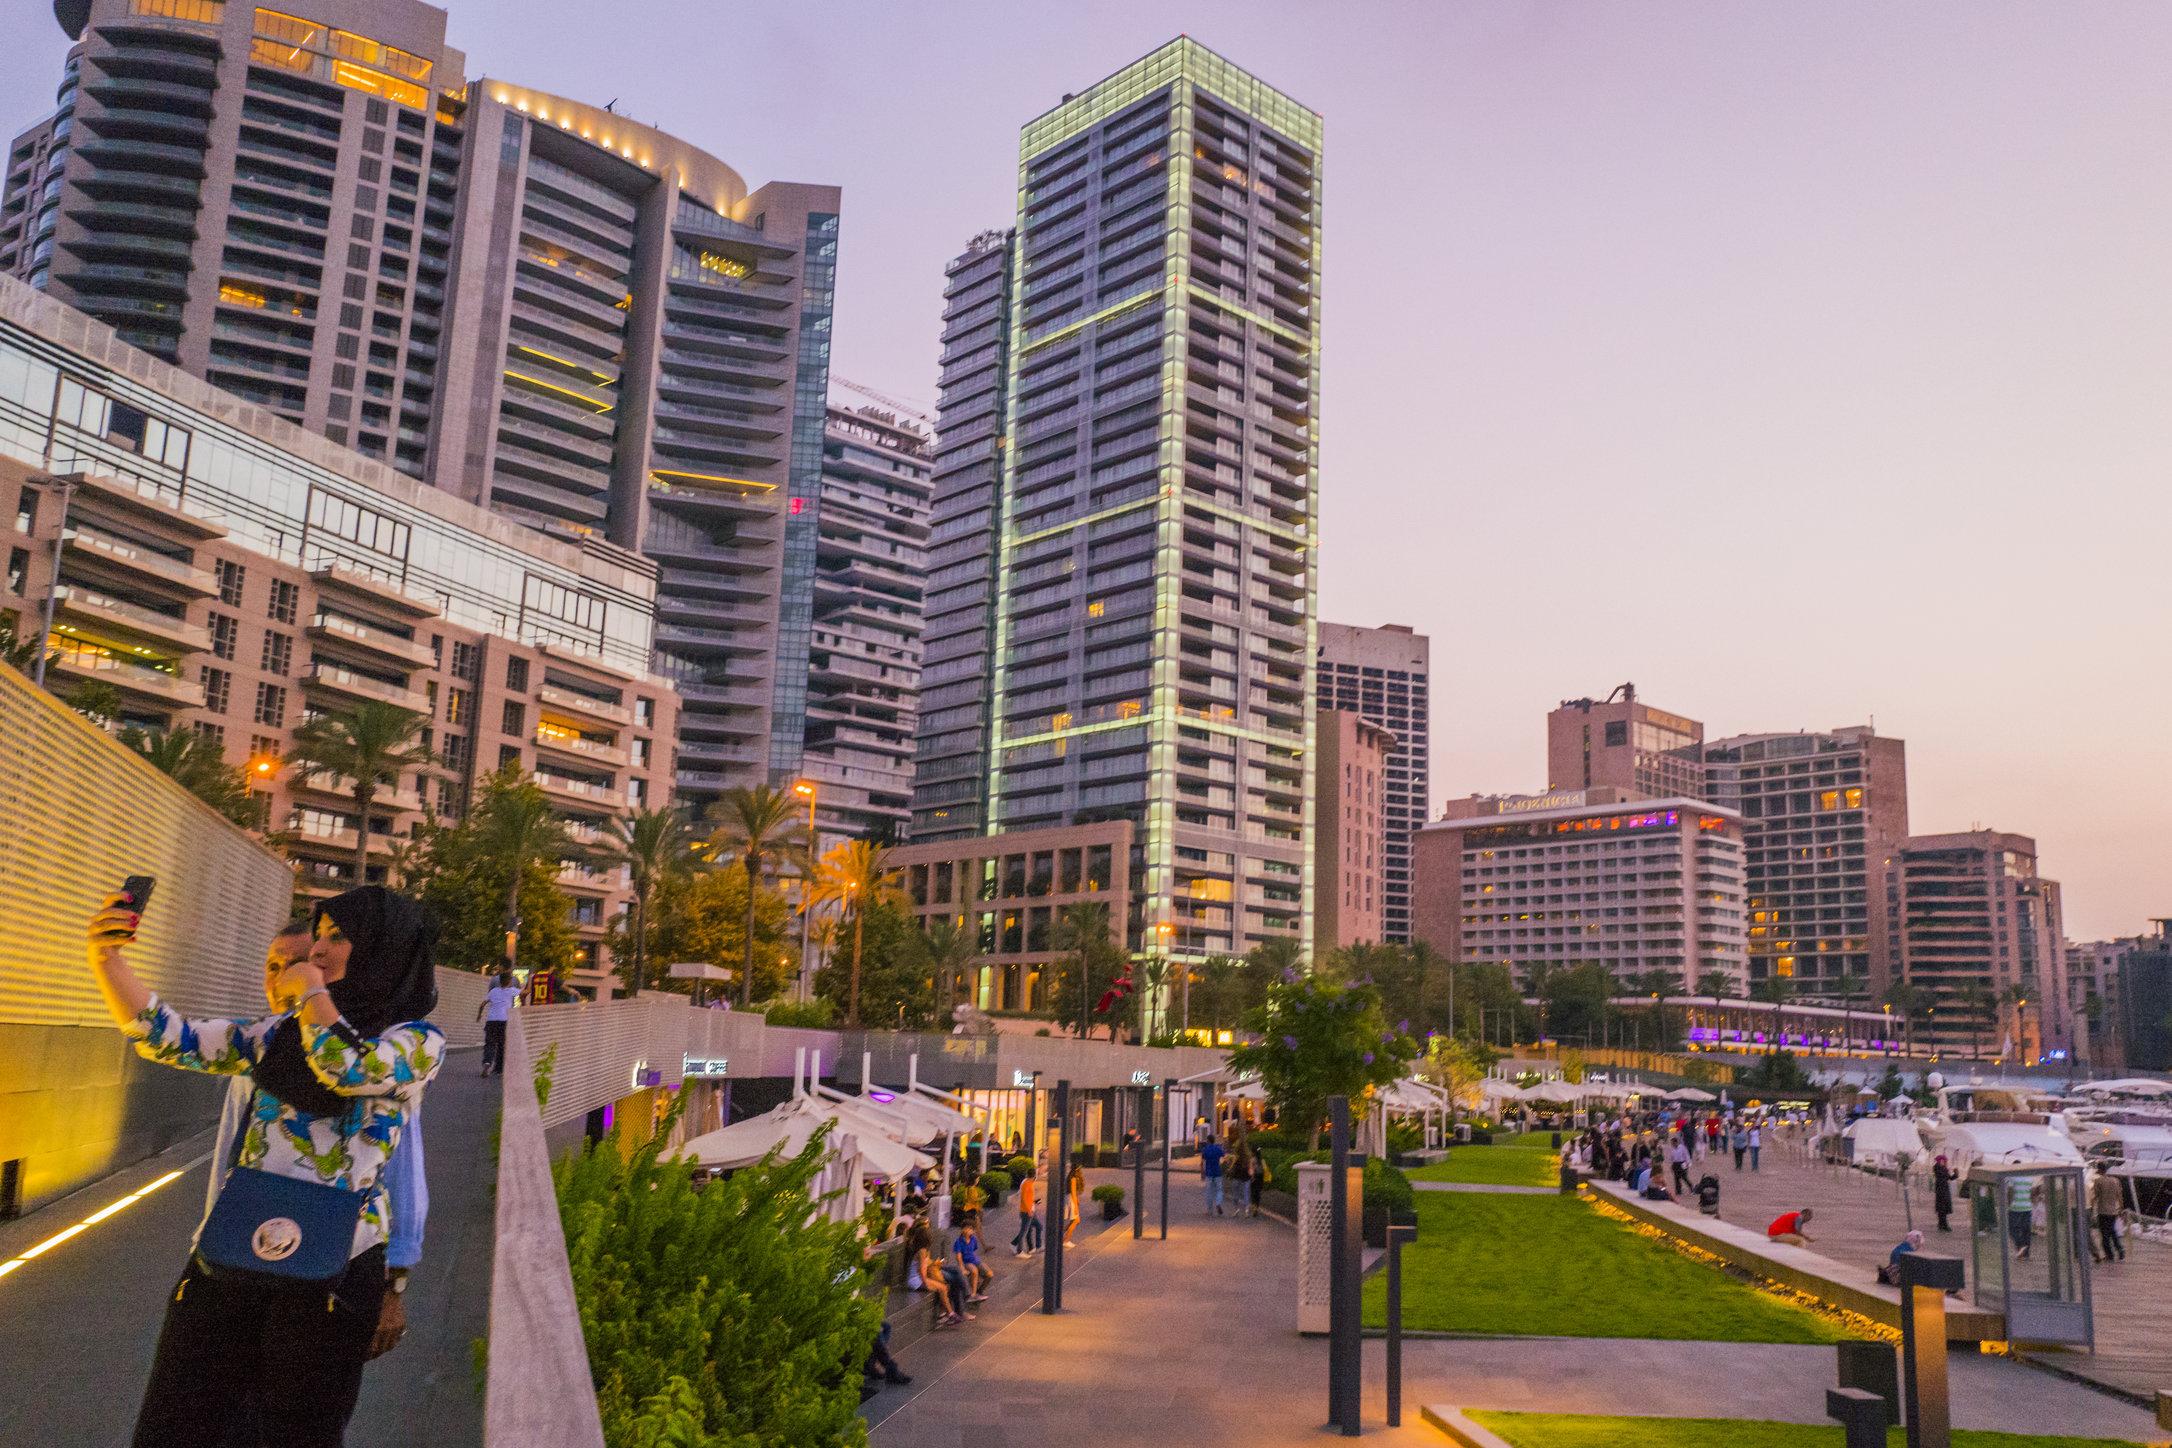 Beirut, Lebanon. 2015.